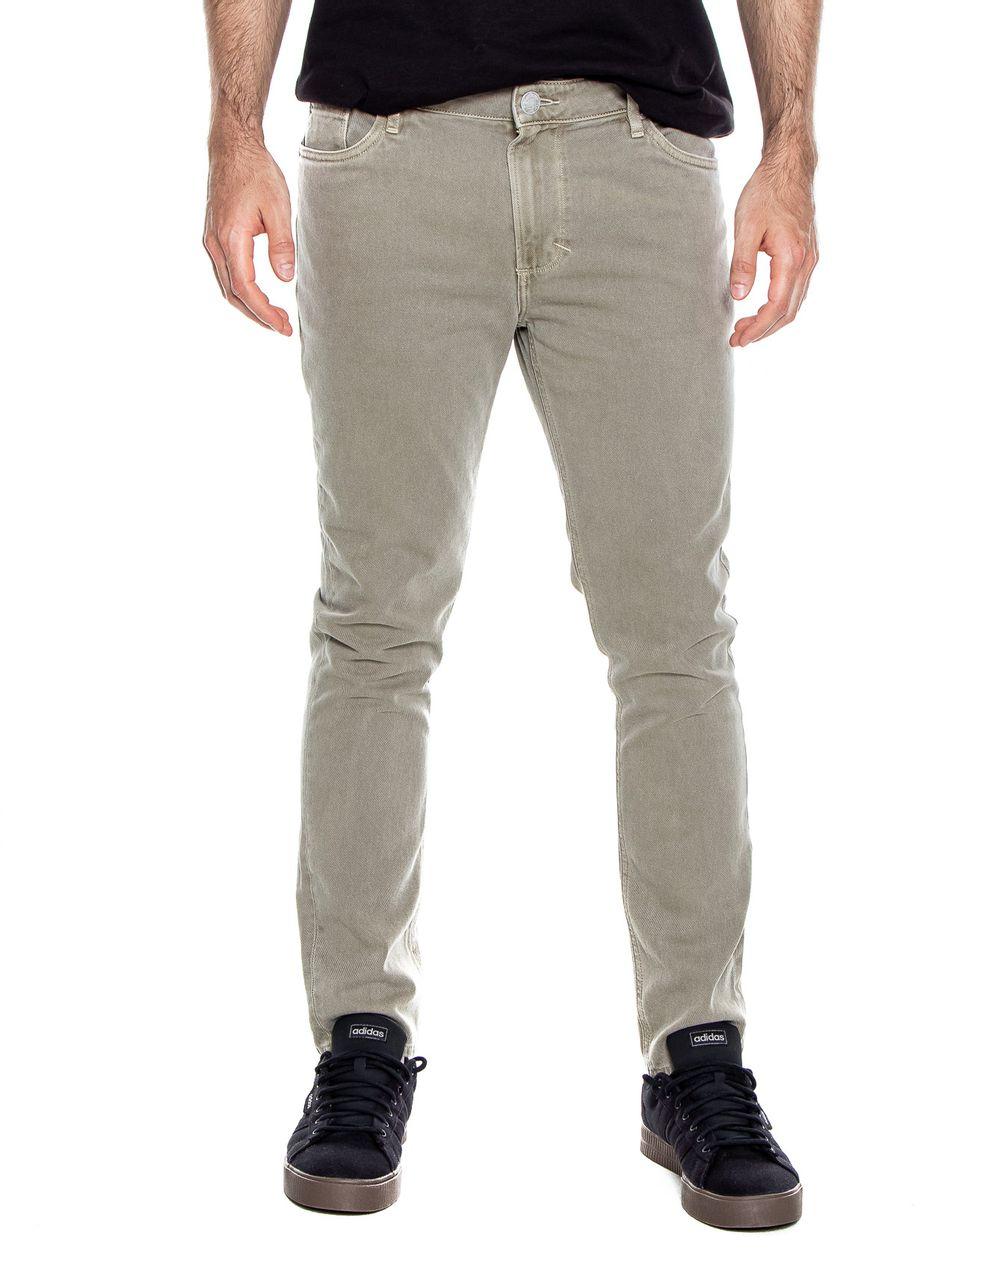 pantalon-042402-verde-1.jpg